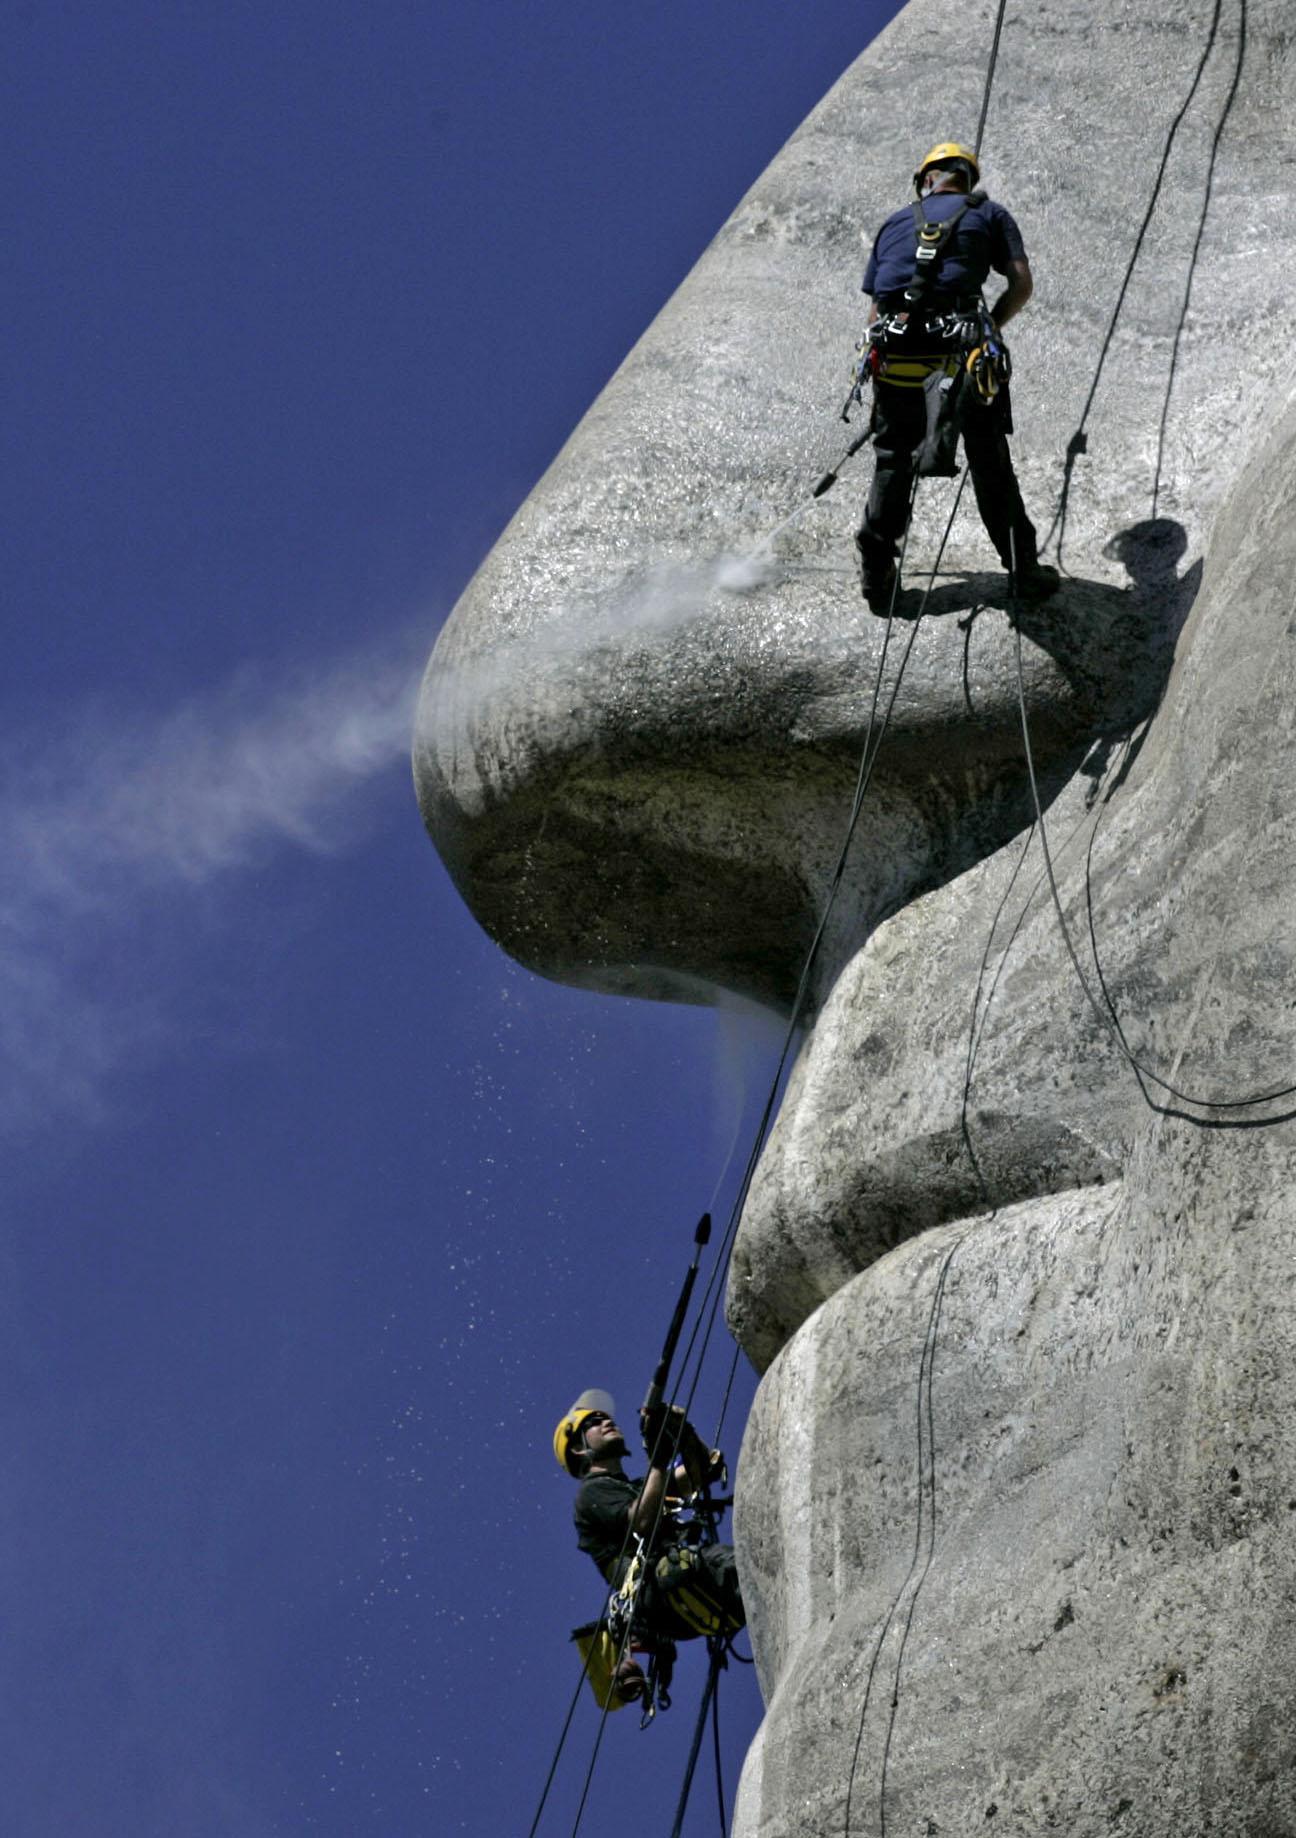 Reinigung des Mount Rushmore National Memorial in South Dakota, USA